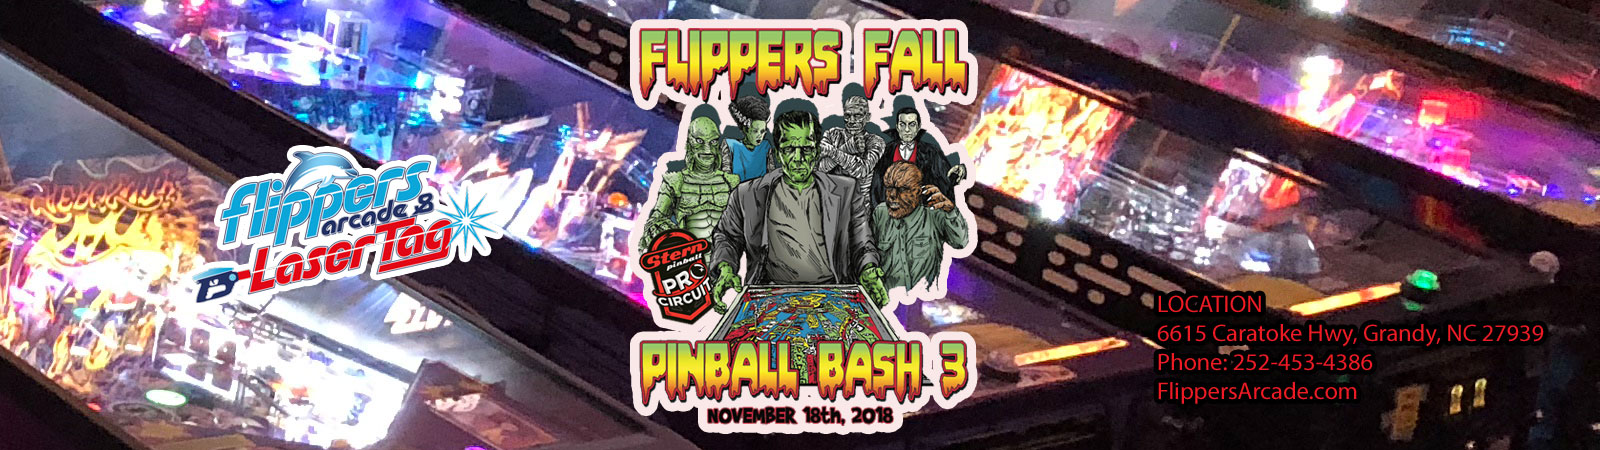 pinball bash 3 2018